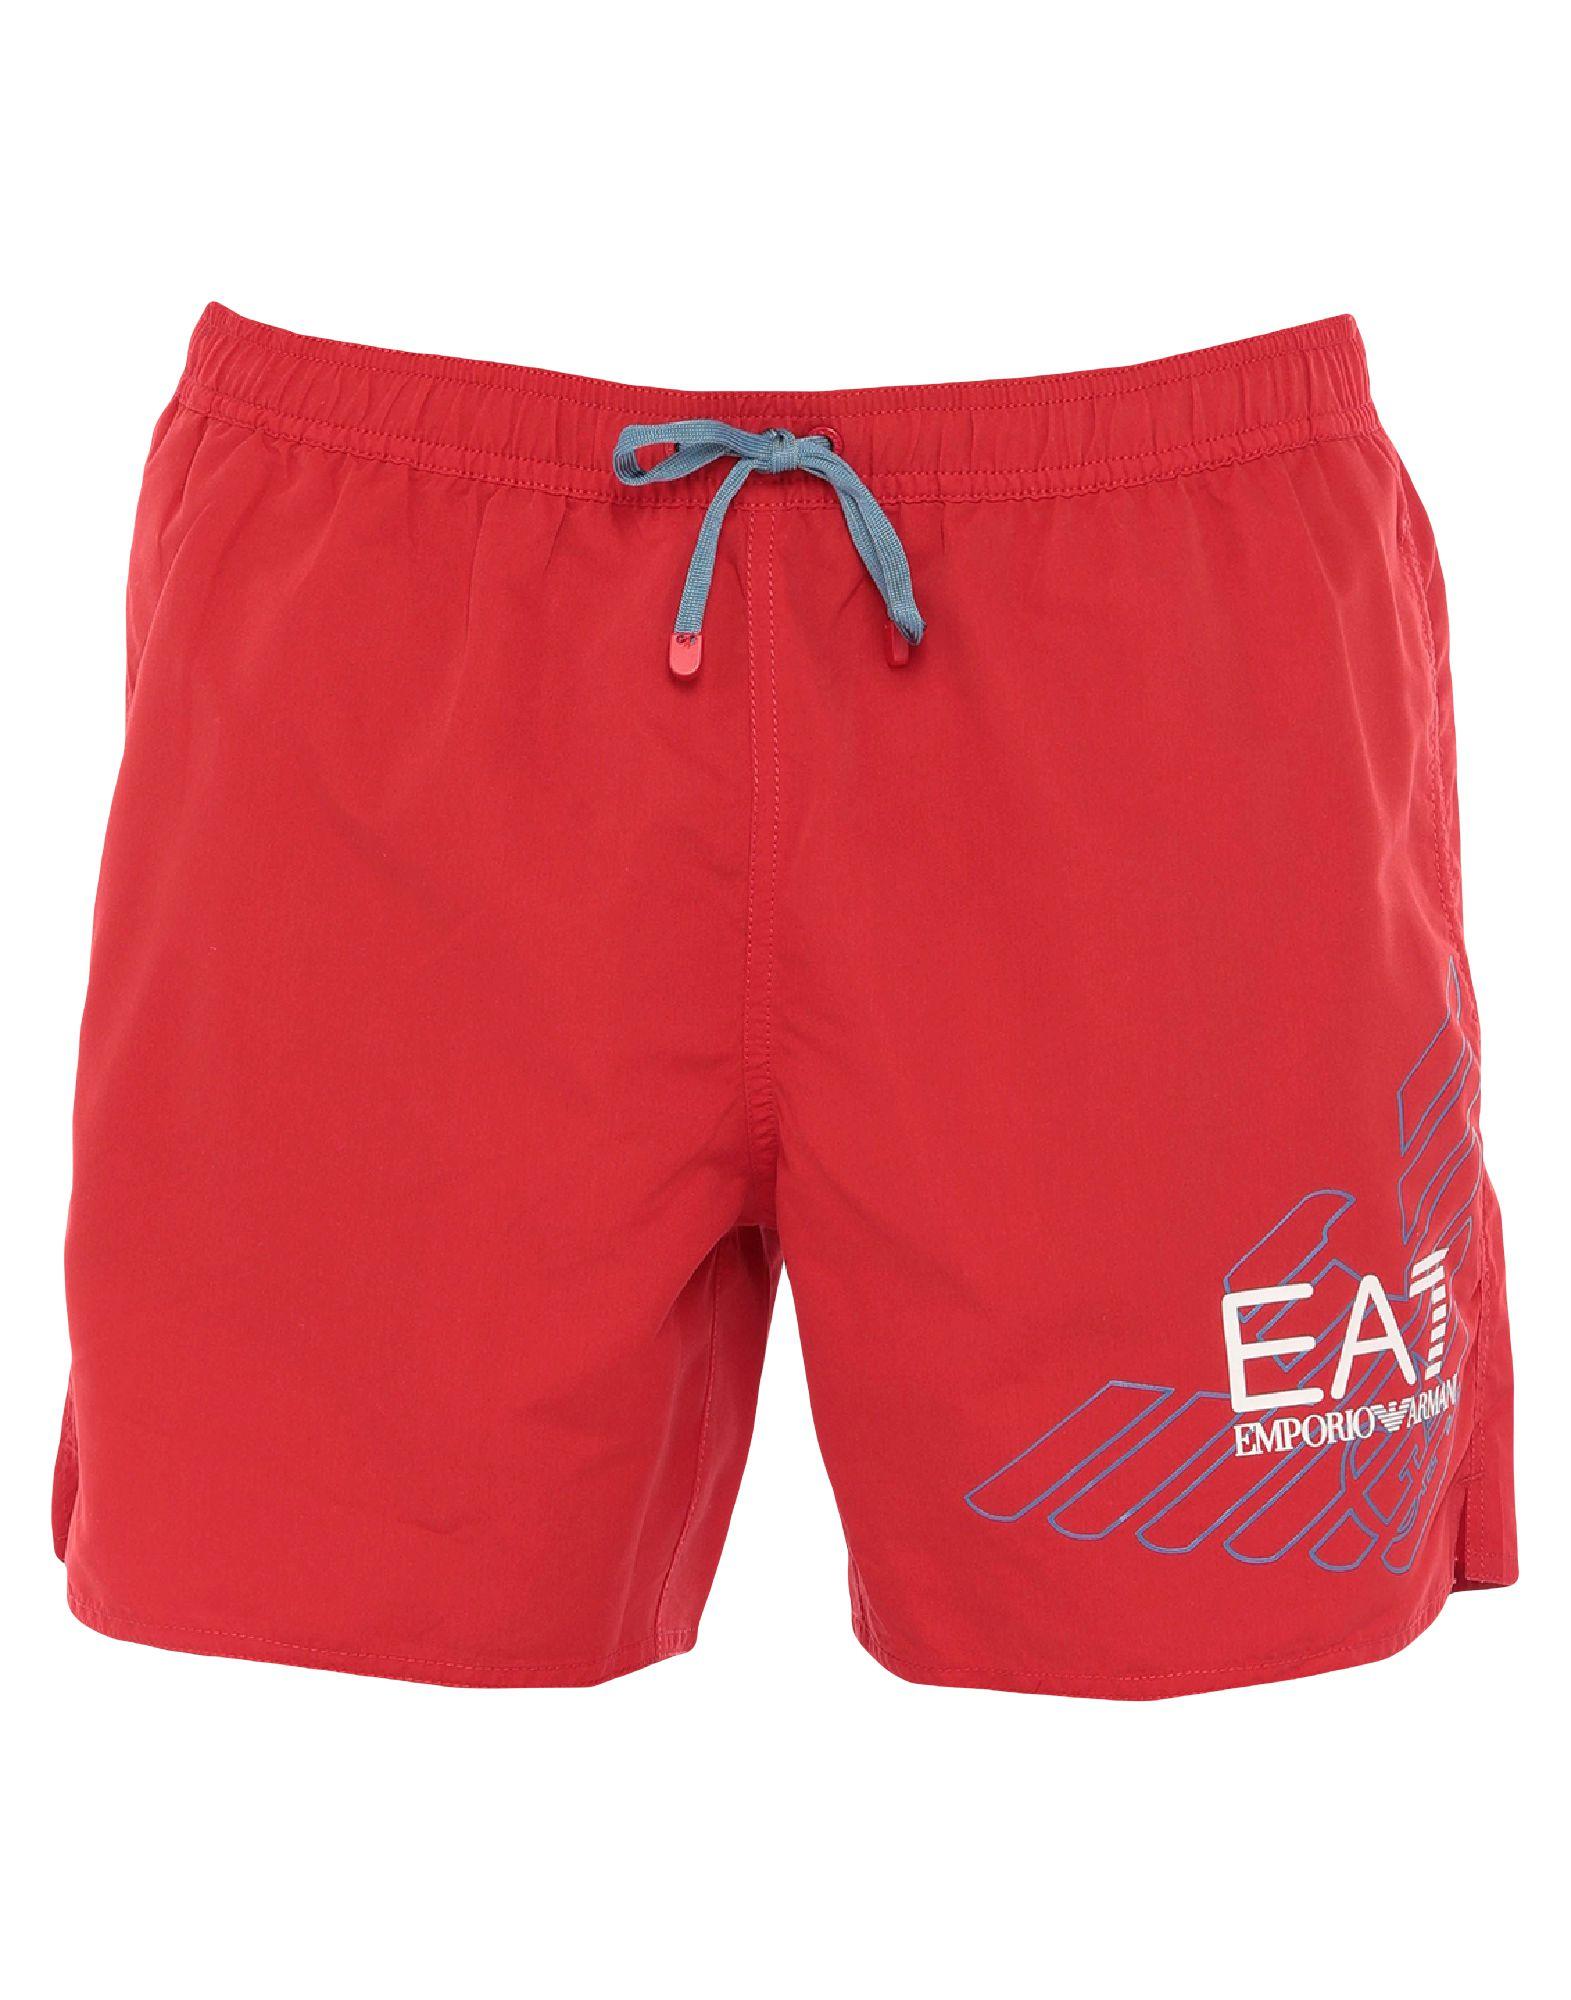 EA7 Swim trunks - Item 47263096